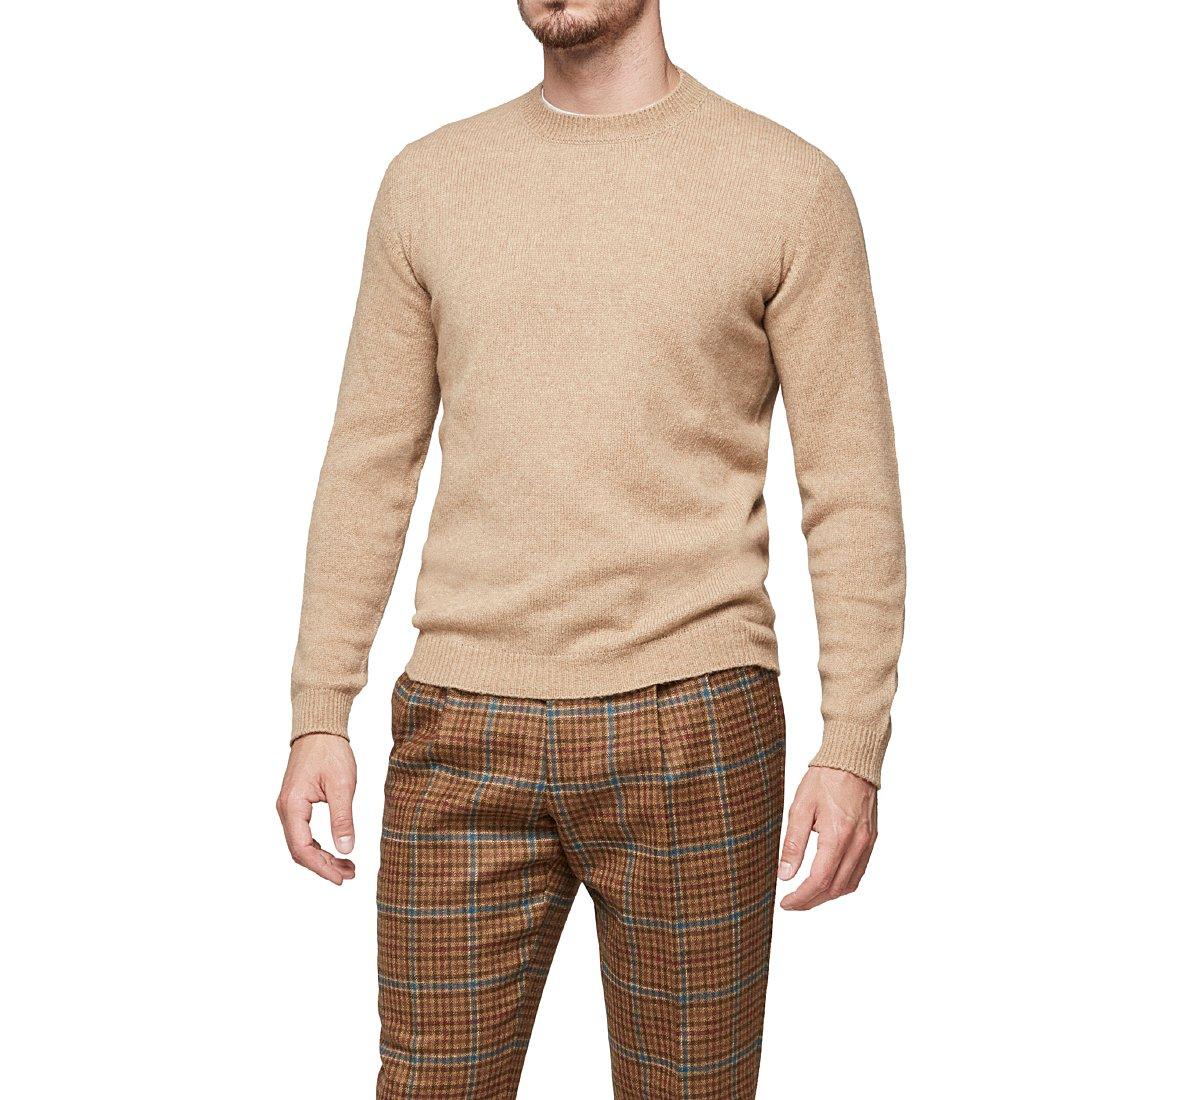 Yarn pullover